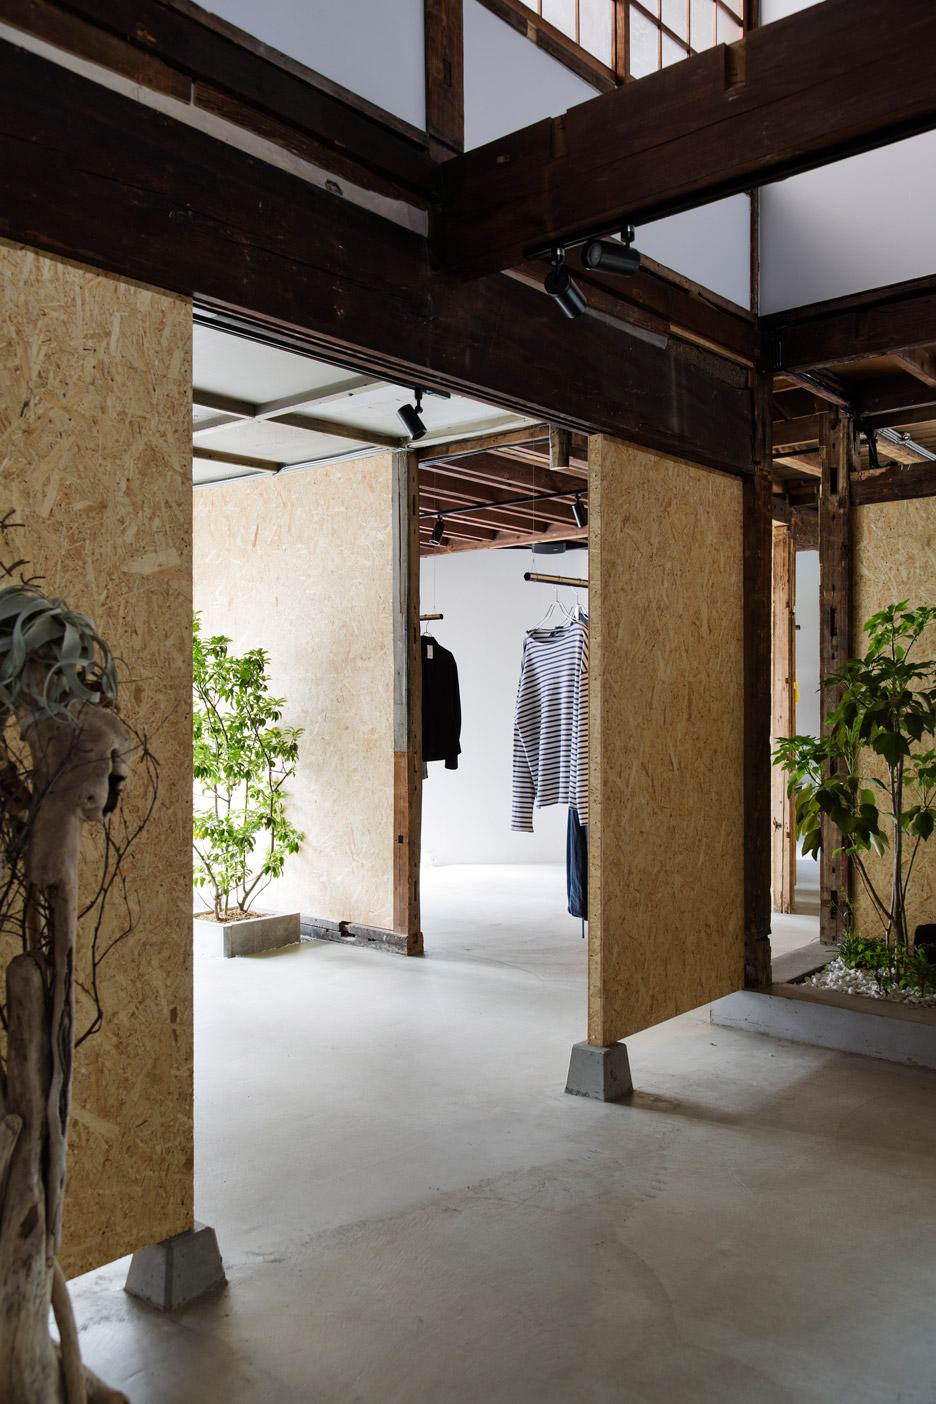 bankara-vintage-clothing-store-manabu-okano_dezeen_936_15-1